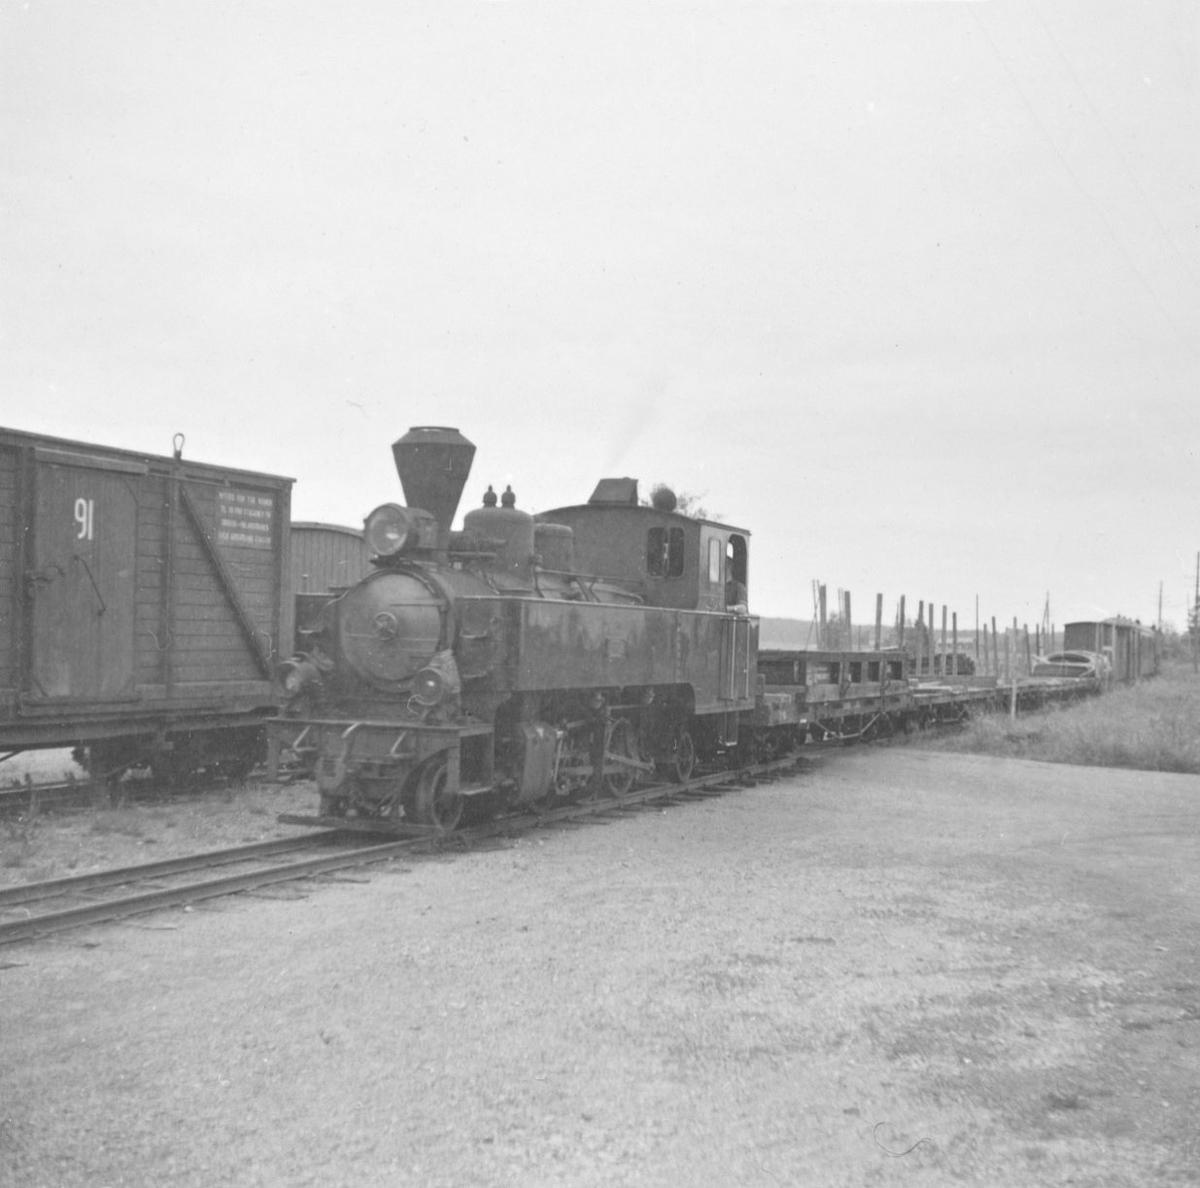 Damplokomotiv XXIXb nr. 7 PRYDZ med blandet tog fra Sørumsand til Skulerud, tog 2051, på Mork stasjon